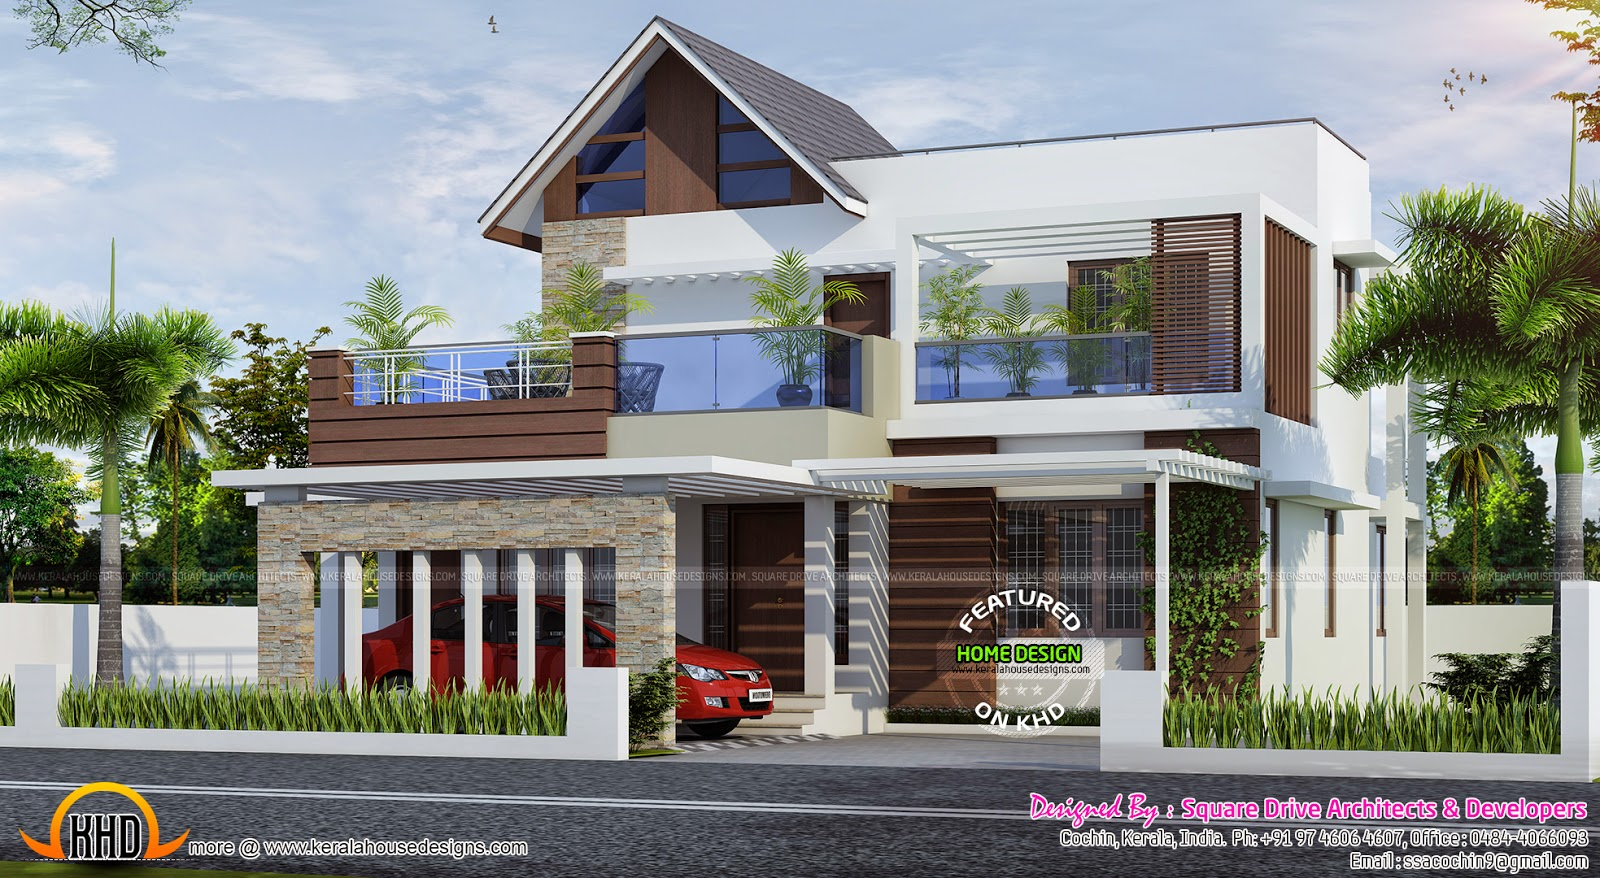 4 Bedroom Attached Modern Home Design